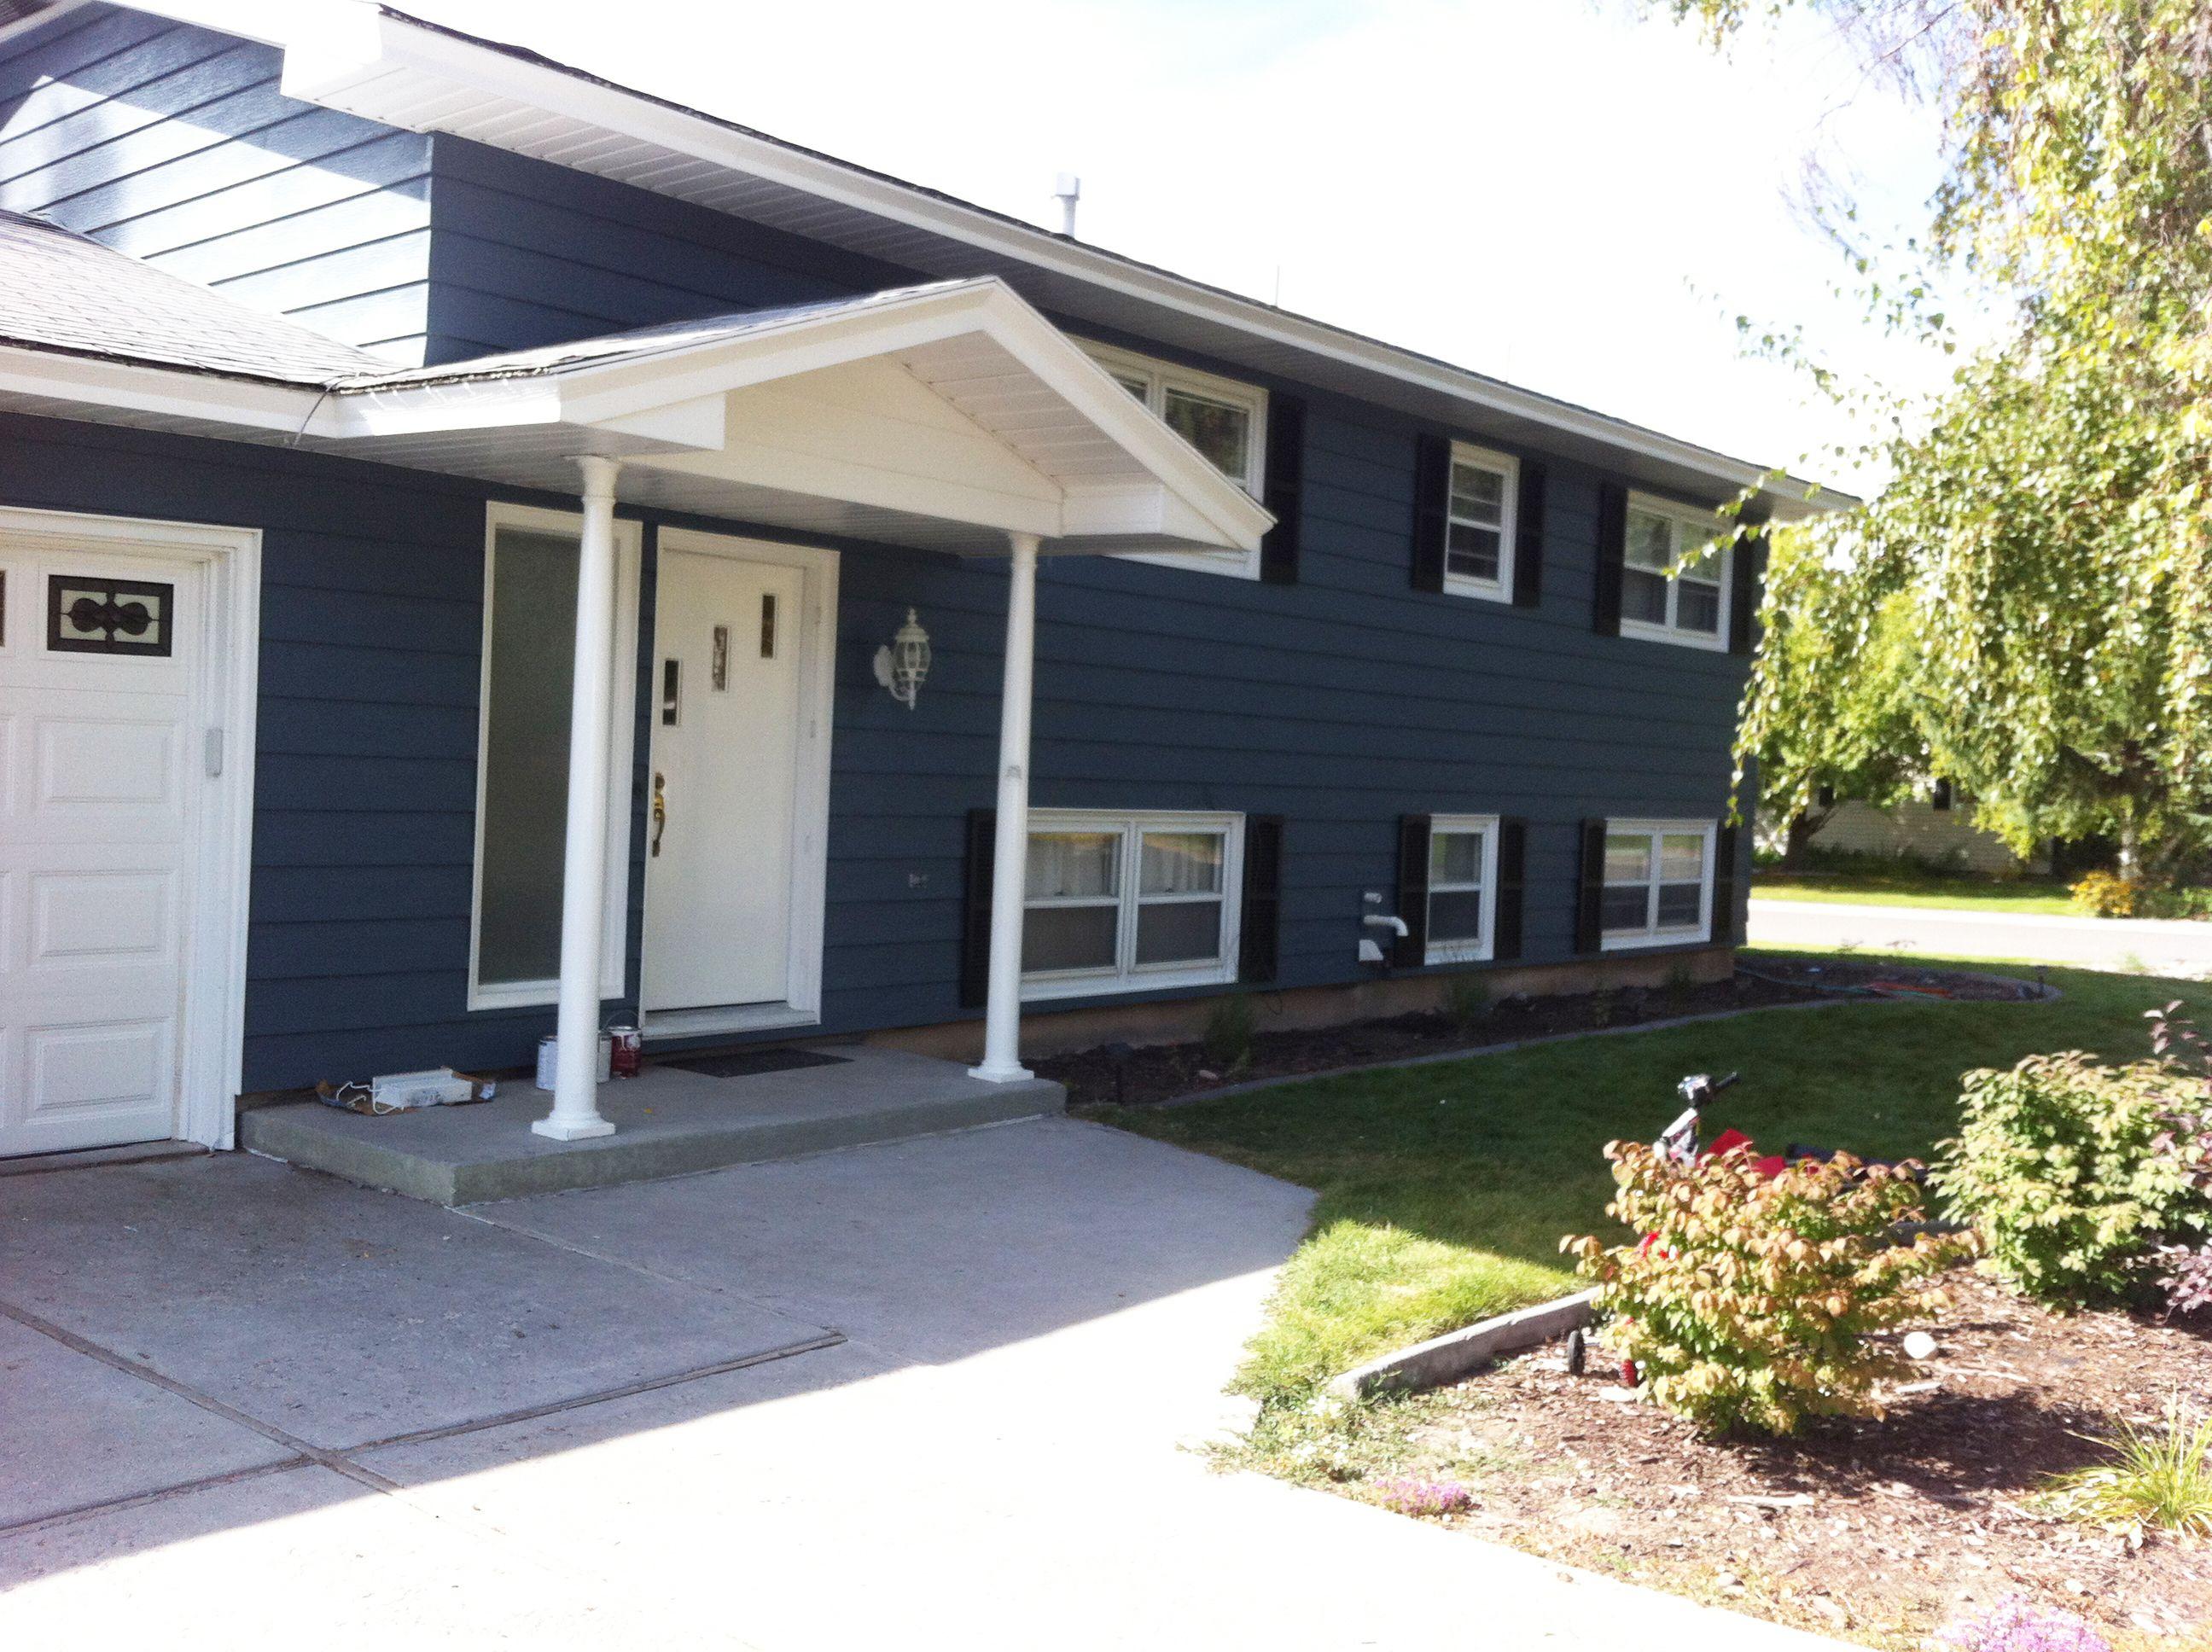 The Prettiest Blue Paint For An Exterior A Giveaway House Exterior Blue Aluminum Siding Colors East Coast House